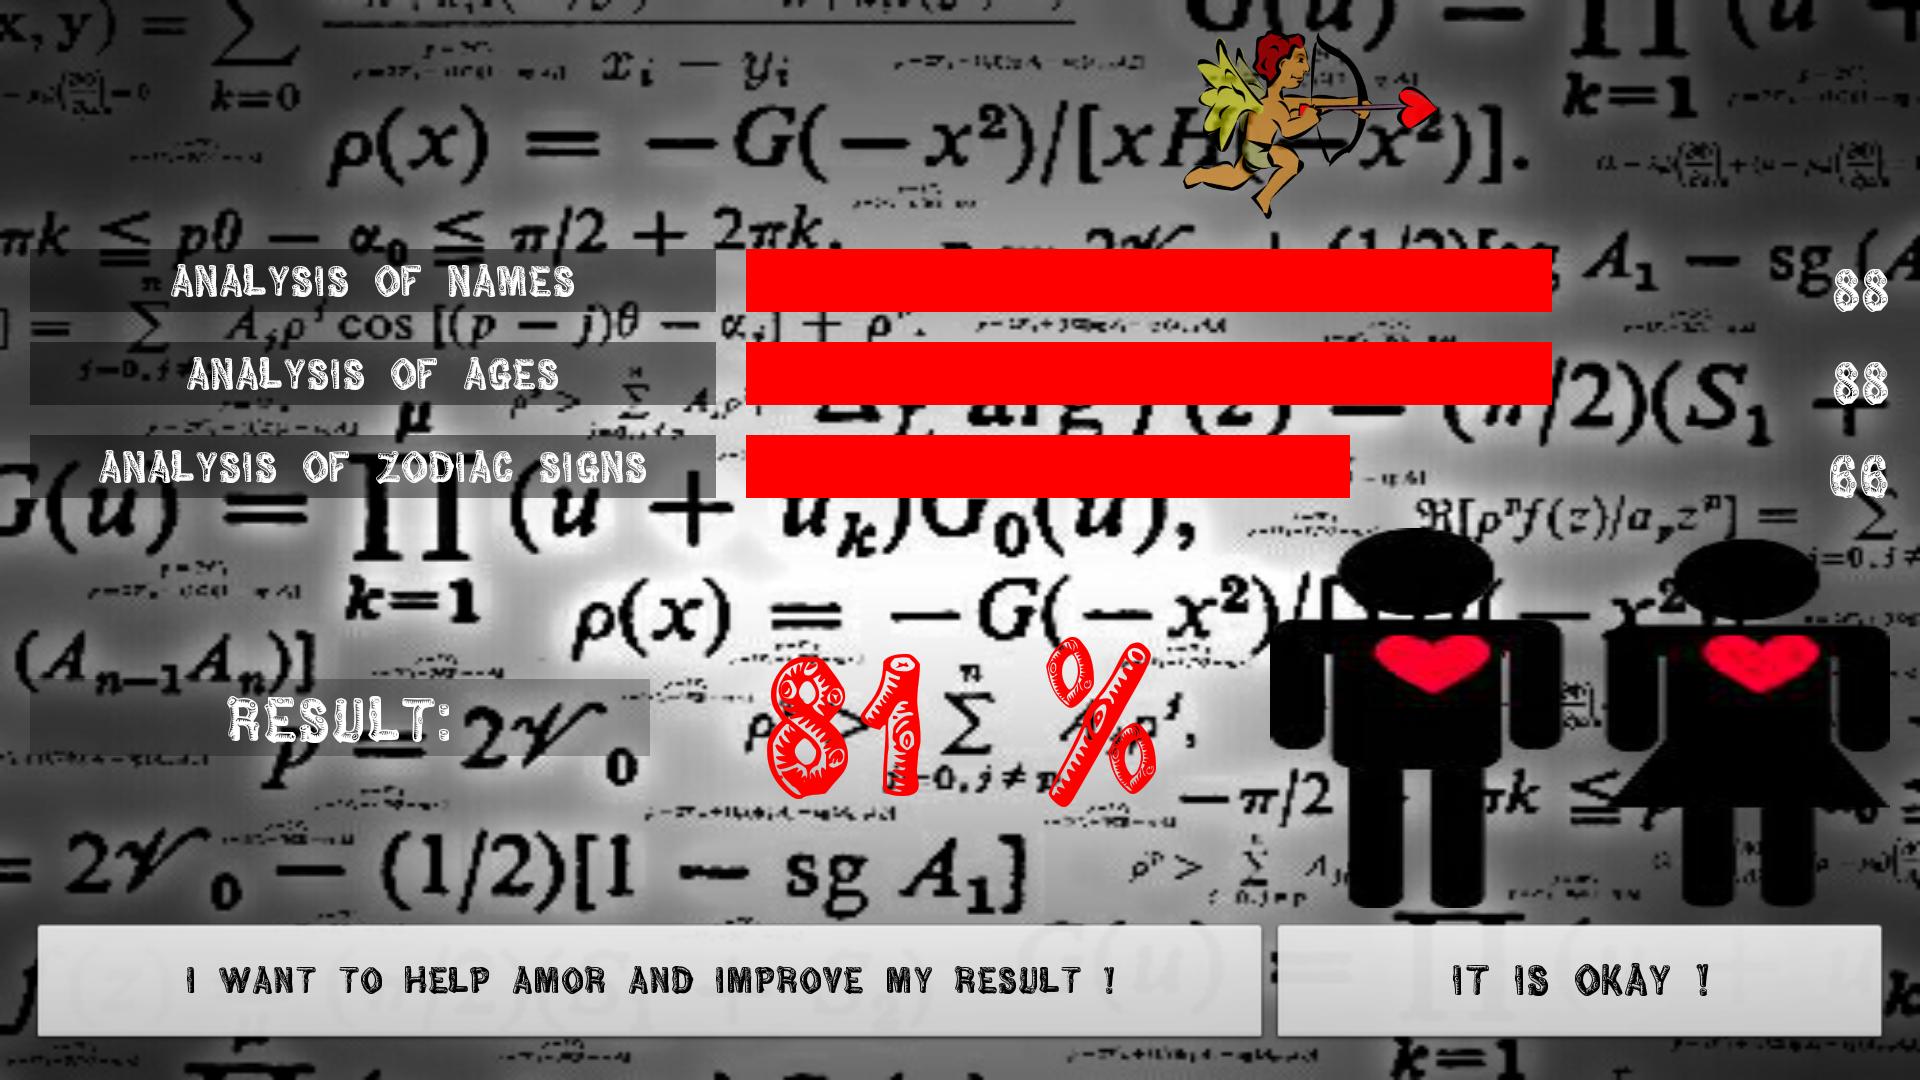 Zoom IMG-3 help amor the love test